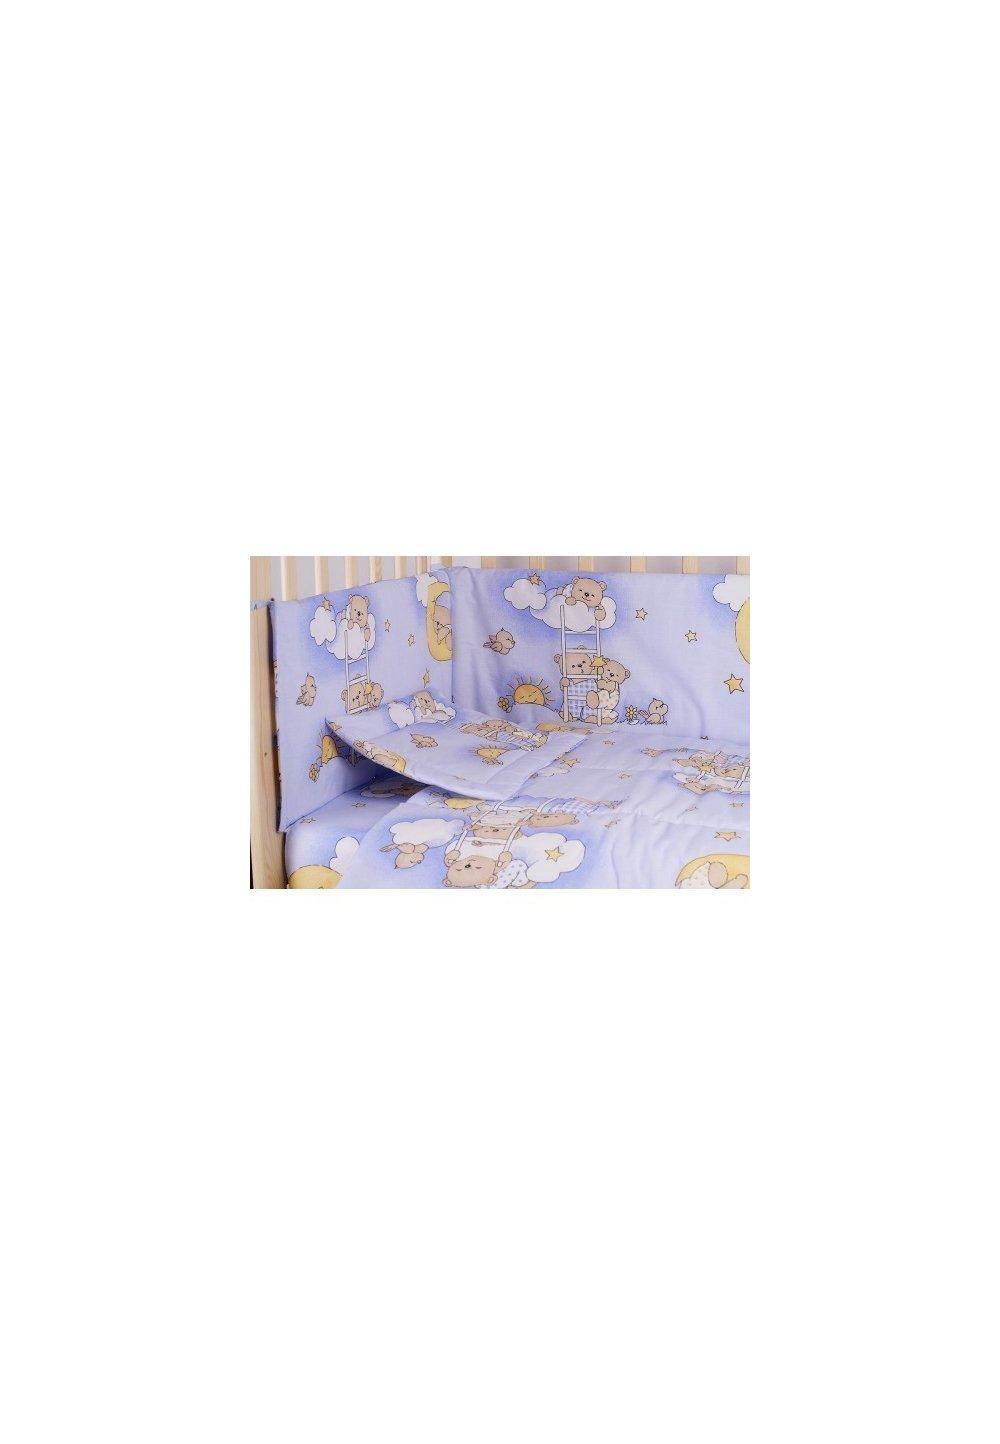 Lenjerie ursuletul somnoros,albastru 5 piese, 140x70cm imagine